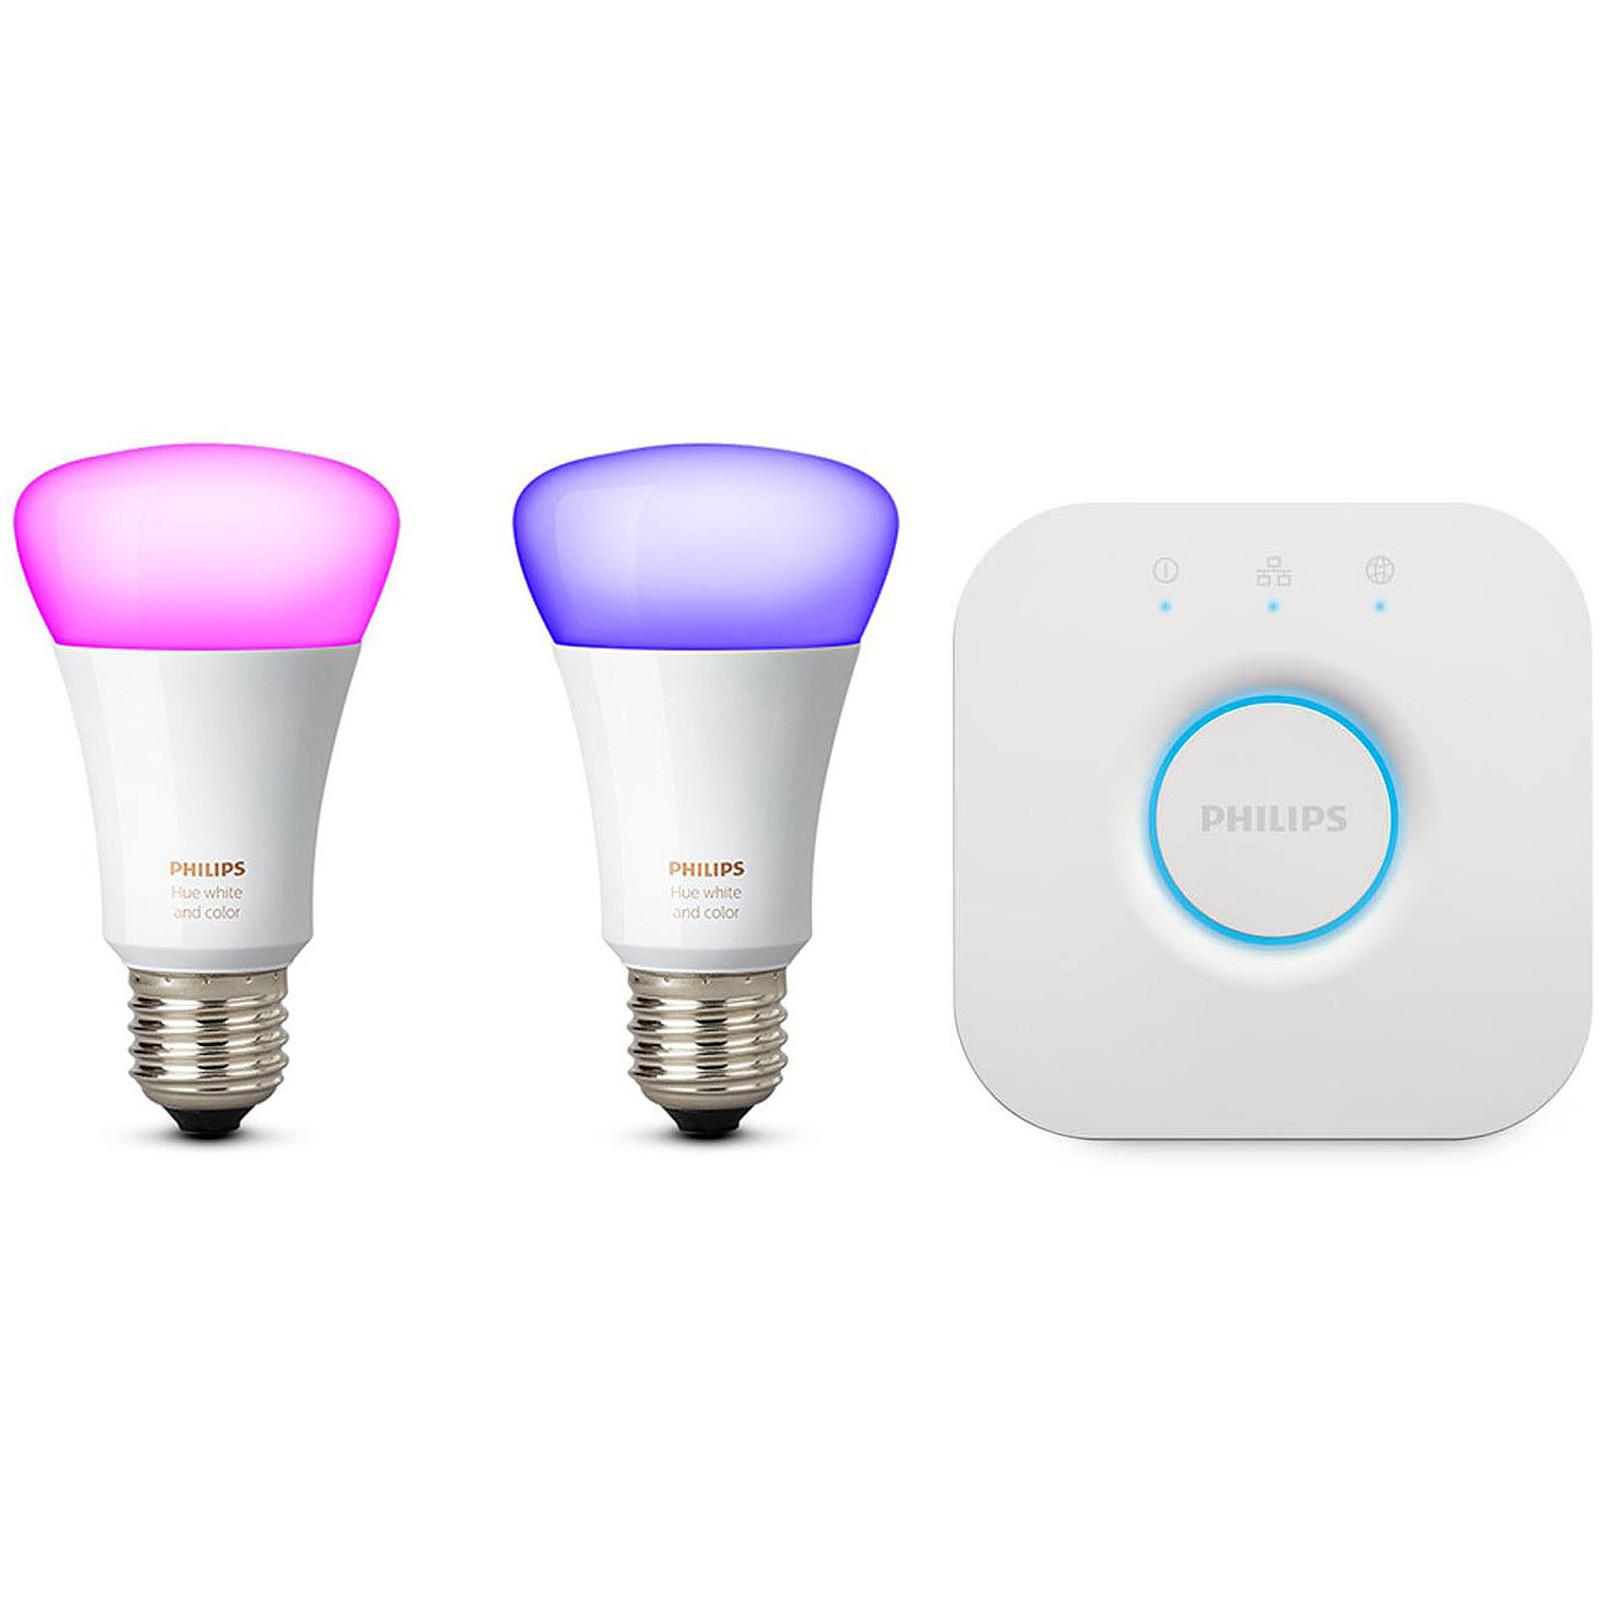 Philips Hue Ampoule LED Connectée Blanc Chaud E27 Bluetooth Pack x2 Alexa Google